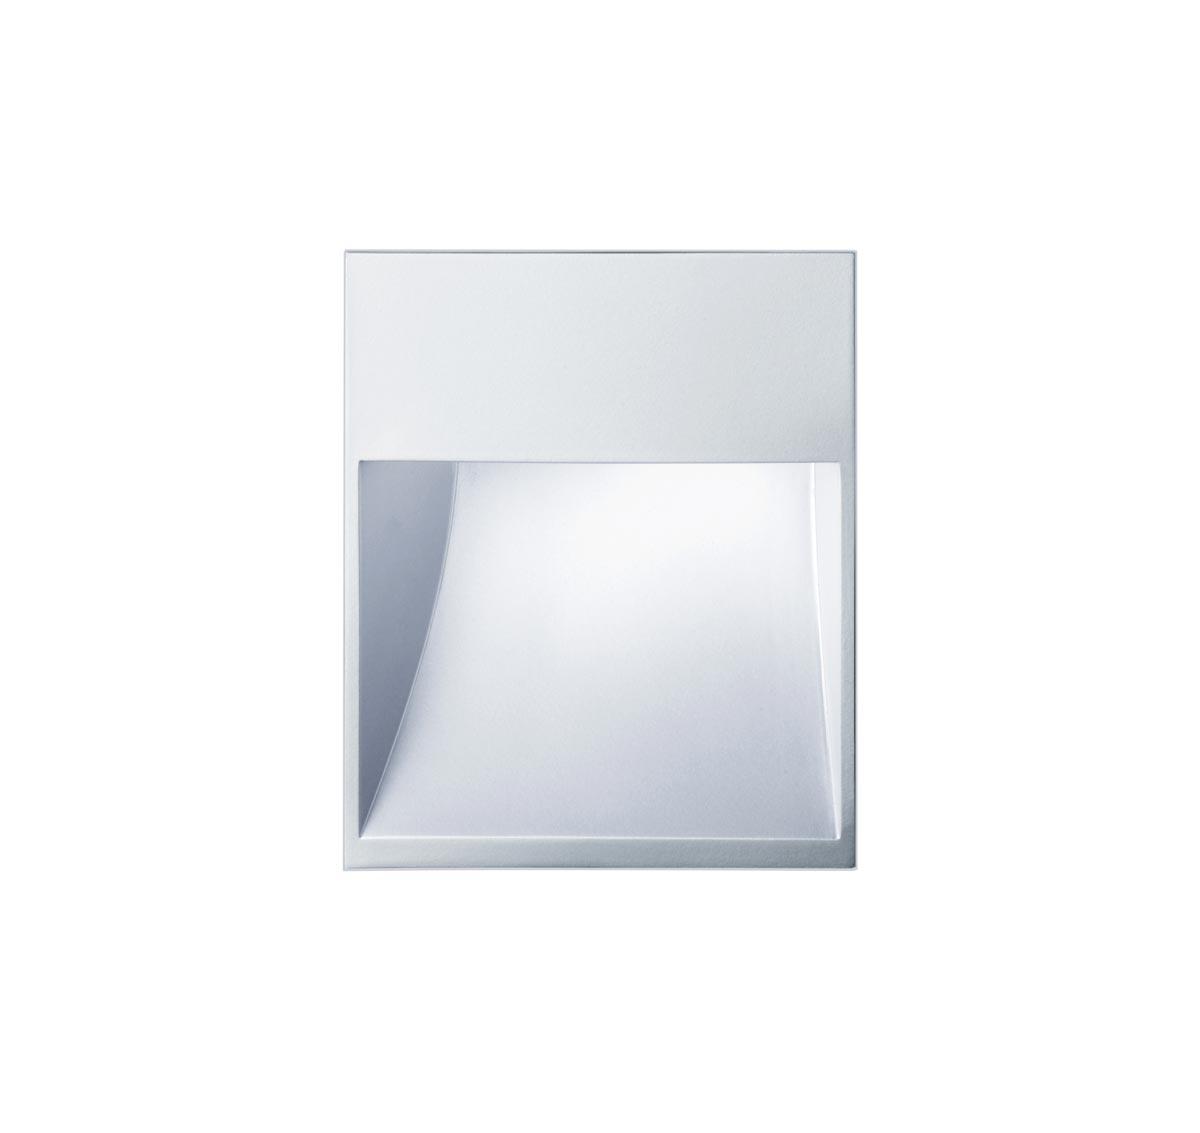 Erco floor washlights design eur 04